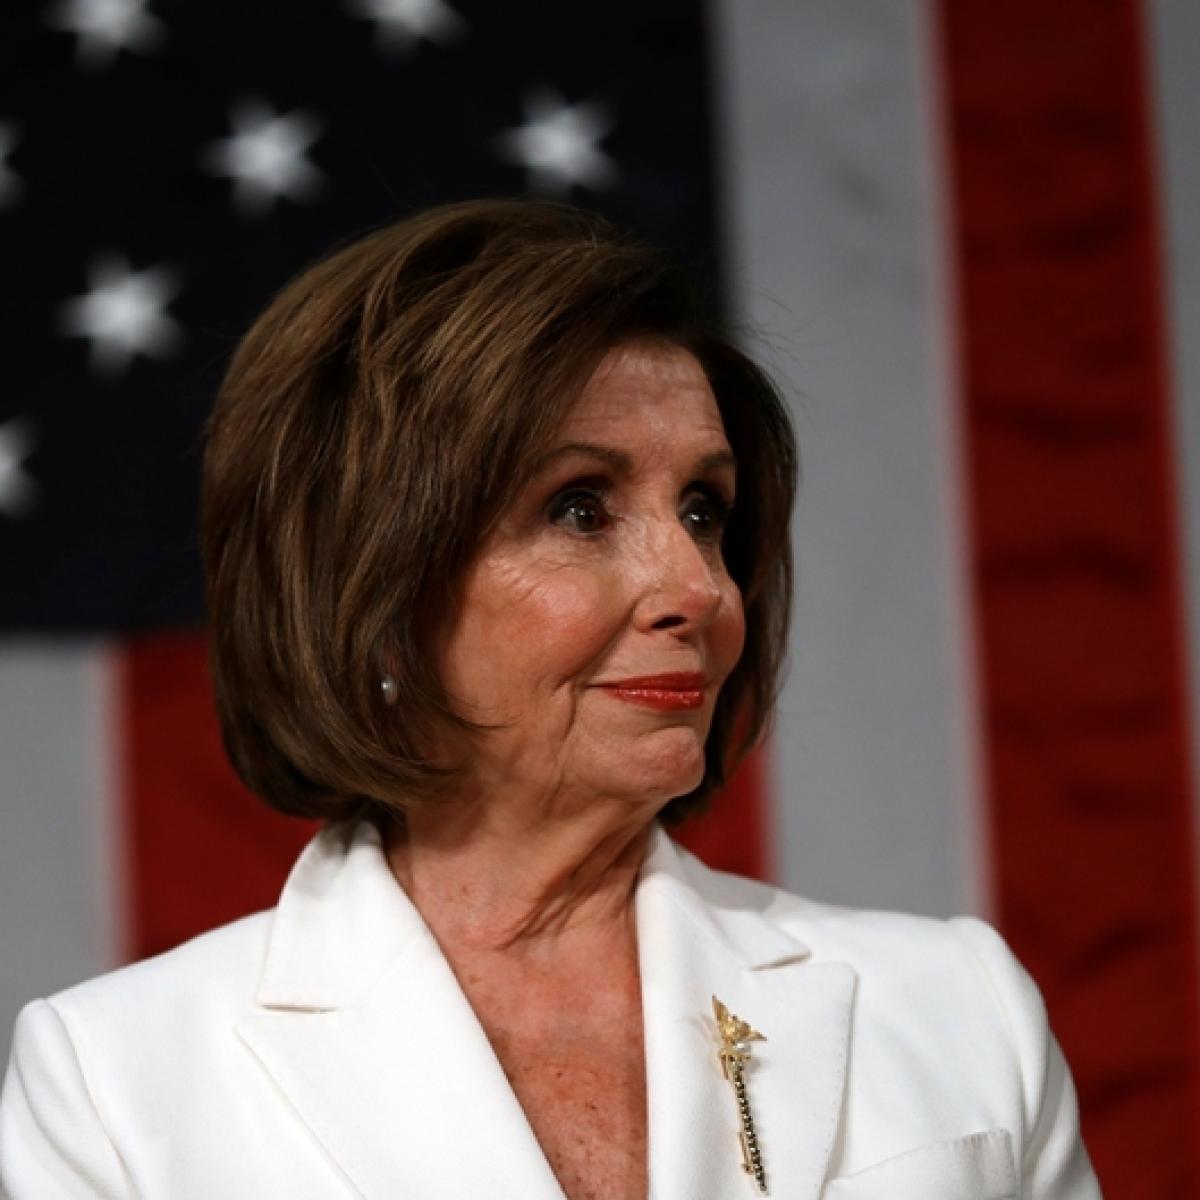 Congresswoman Nancy Pelosi reelected as speaker of US House of Representatives